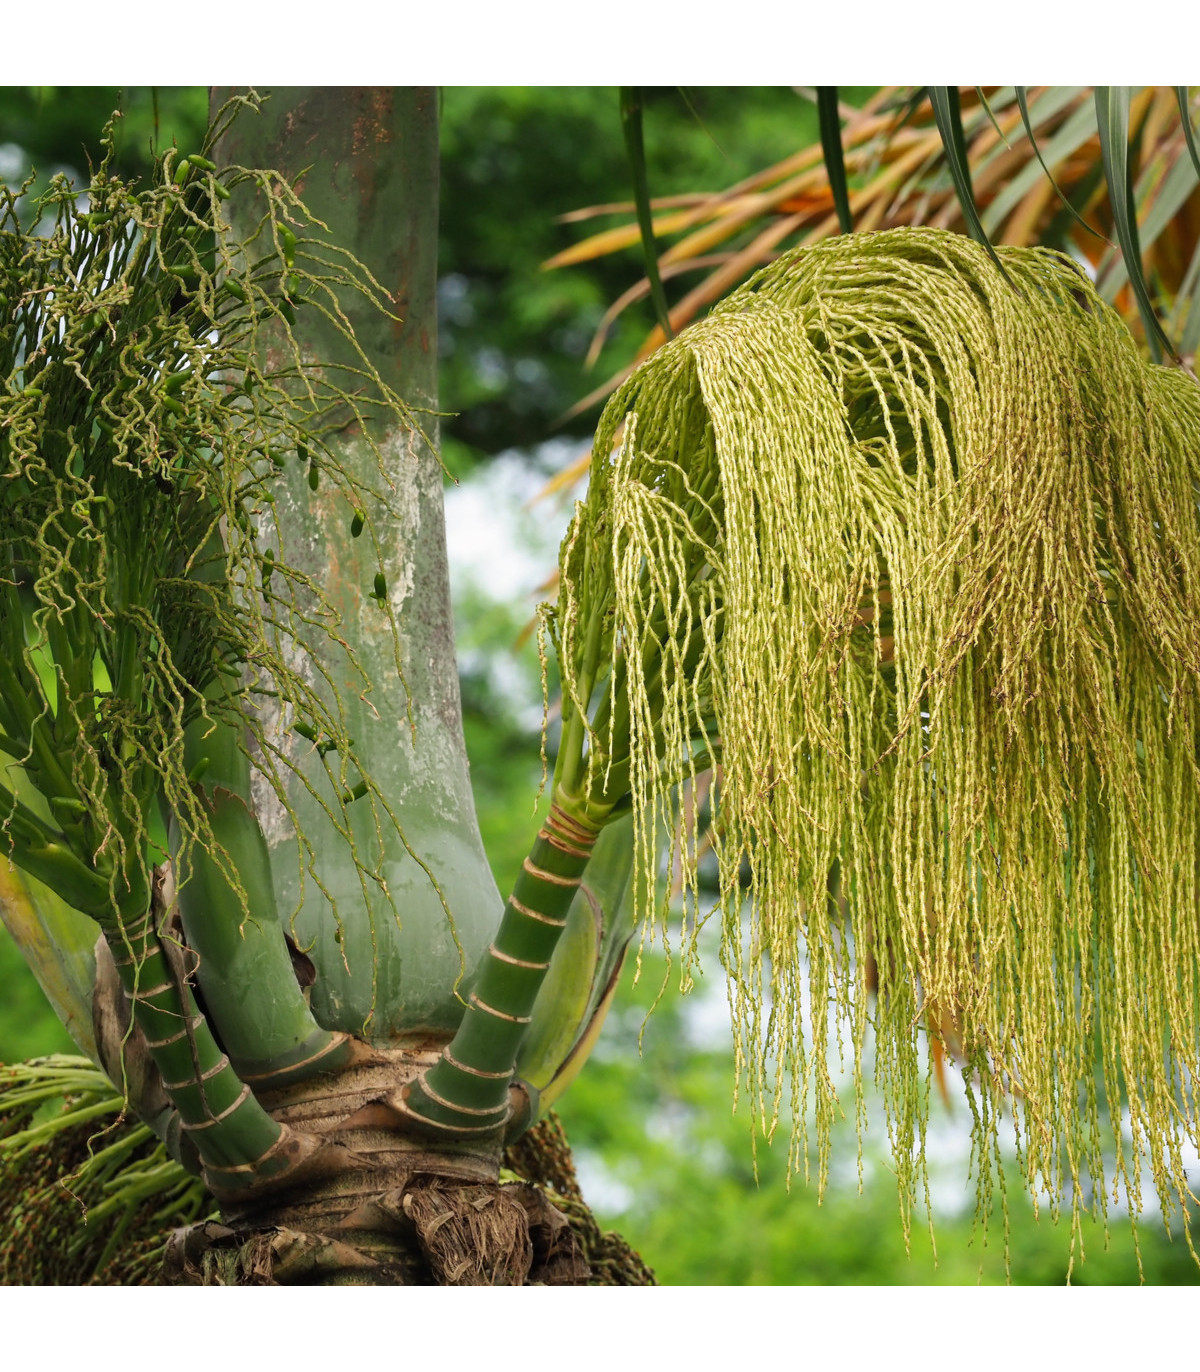 Palma lahvová - semena Palmy - Hyophorbe lagenicaulis - 3 ks